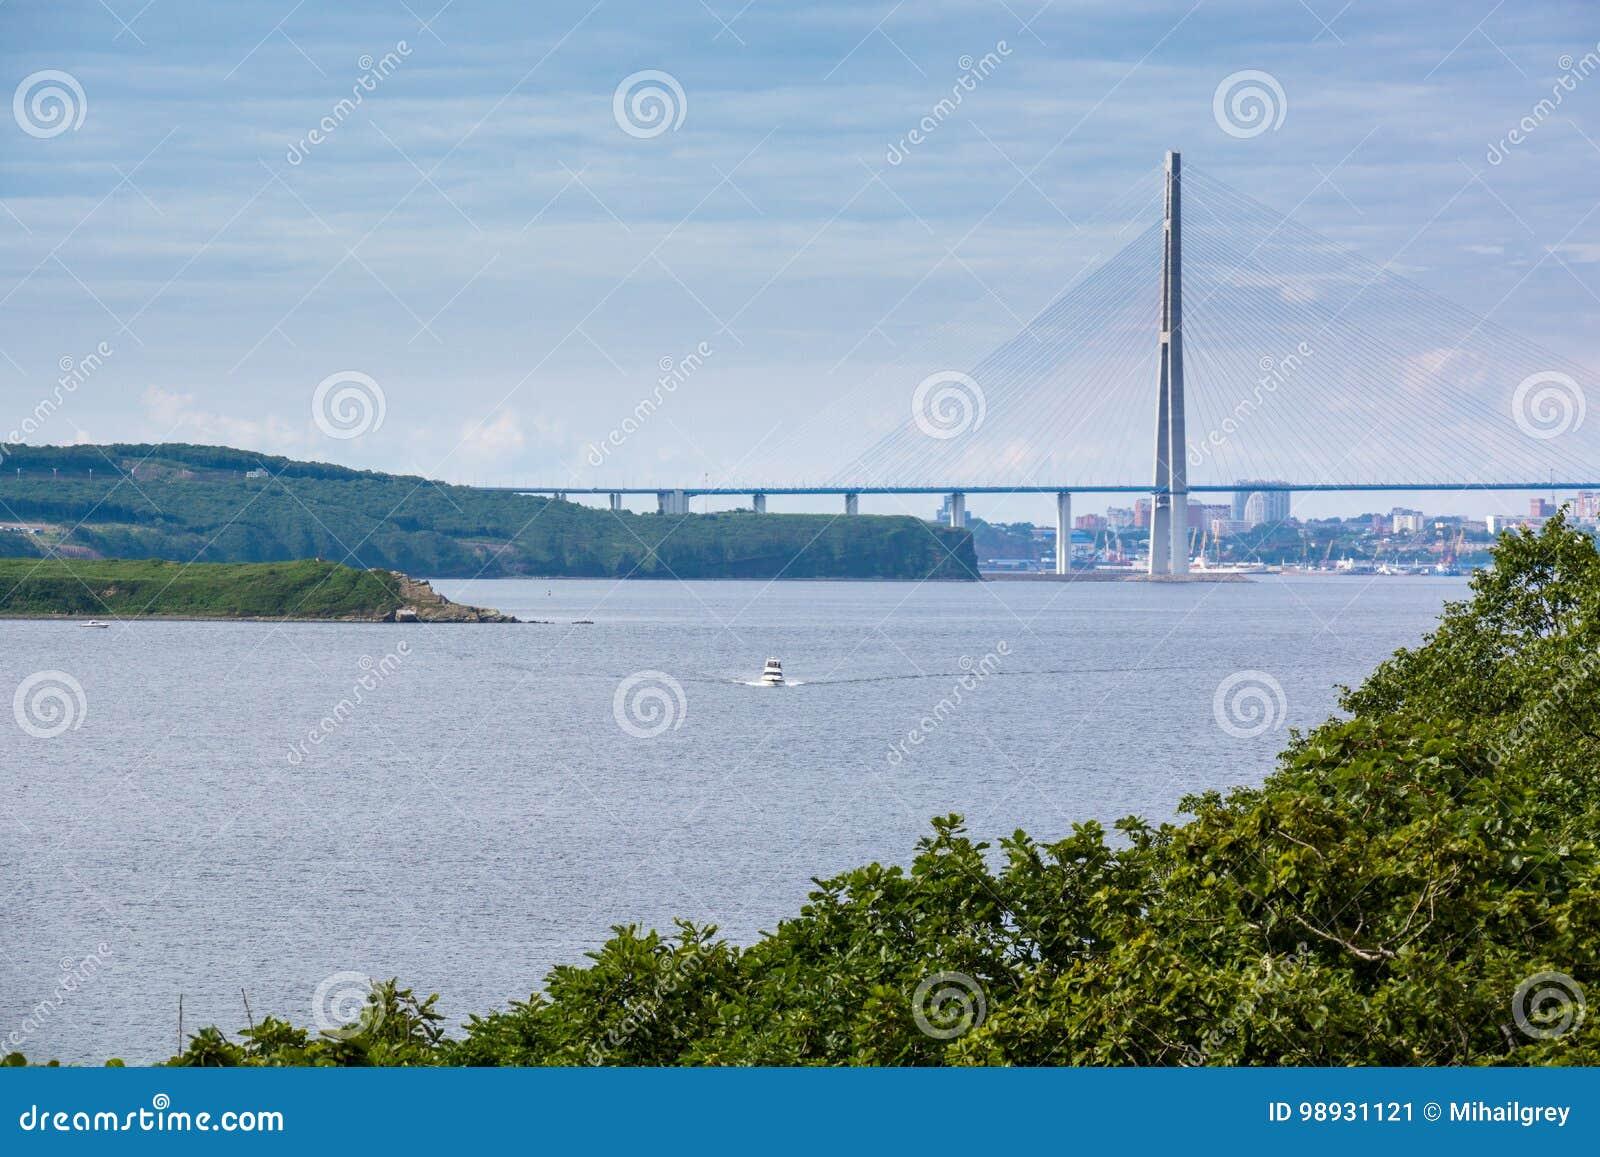 Sea bay and big bridge on background.